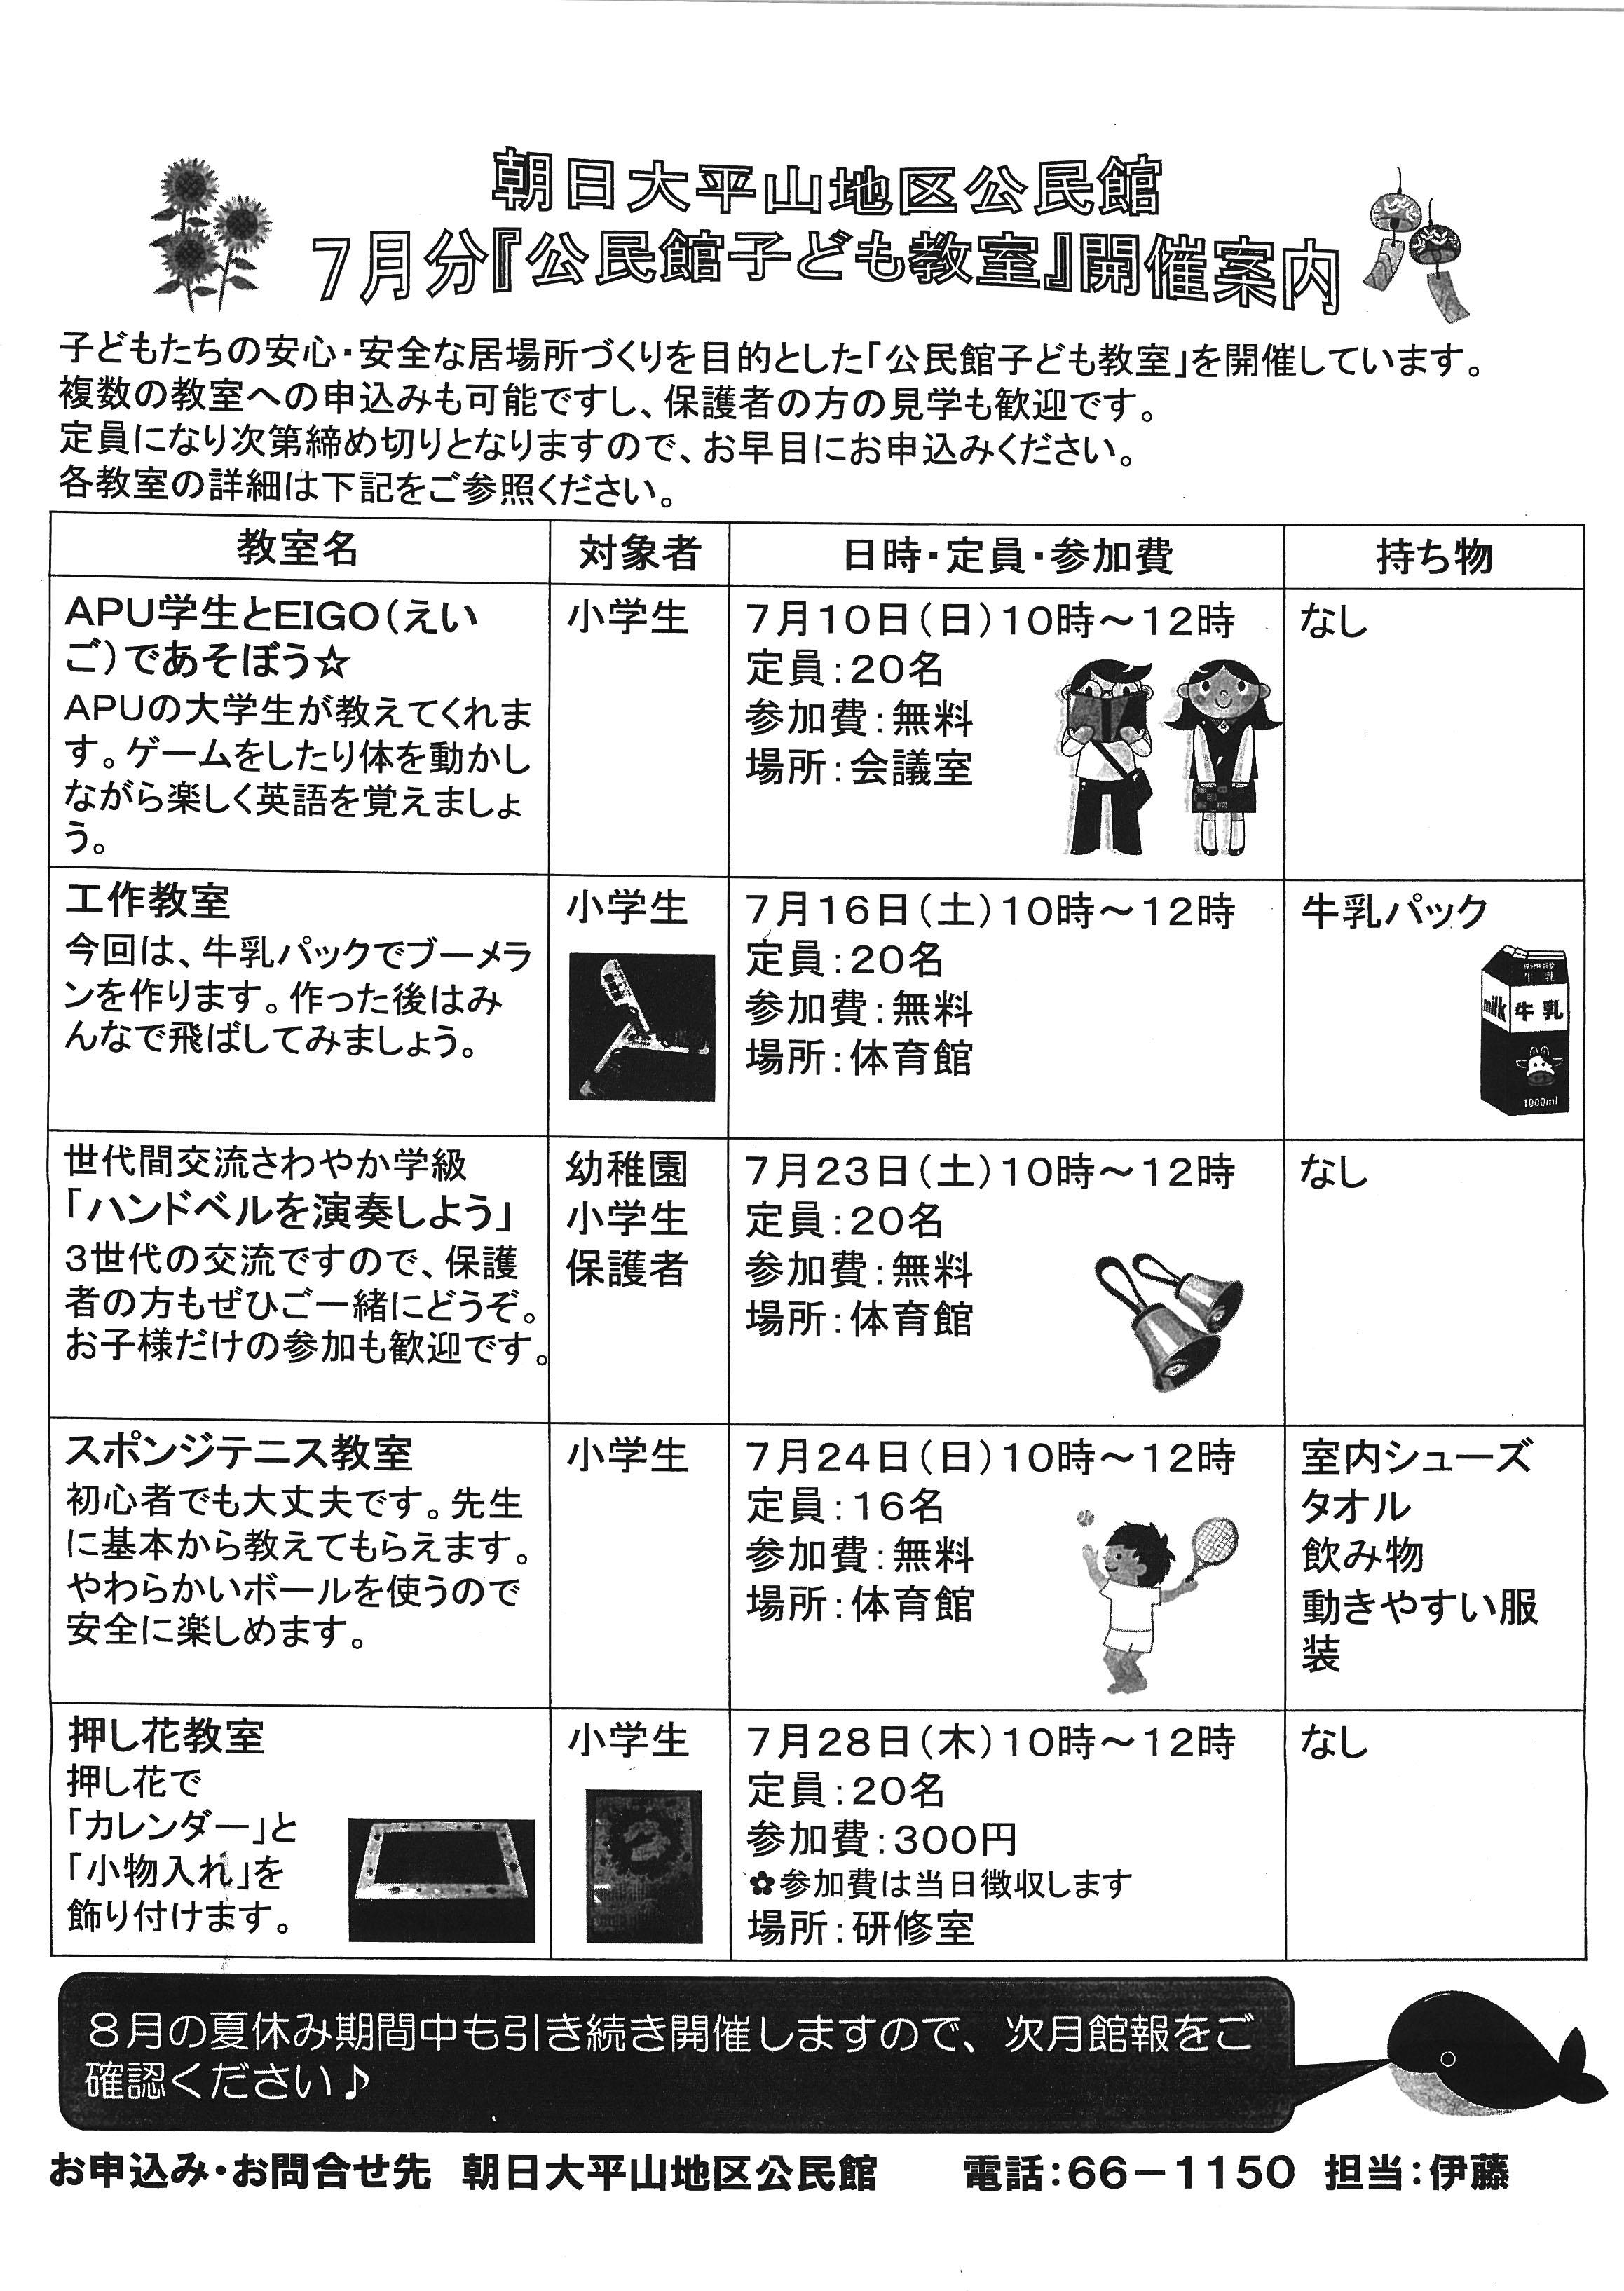 asahitaiheiyama07-2